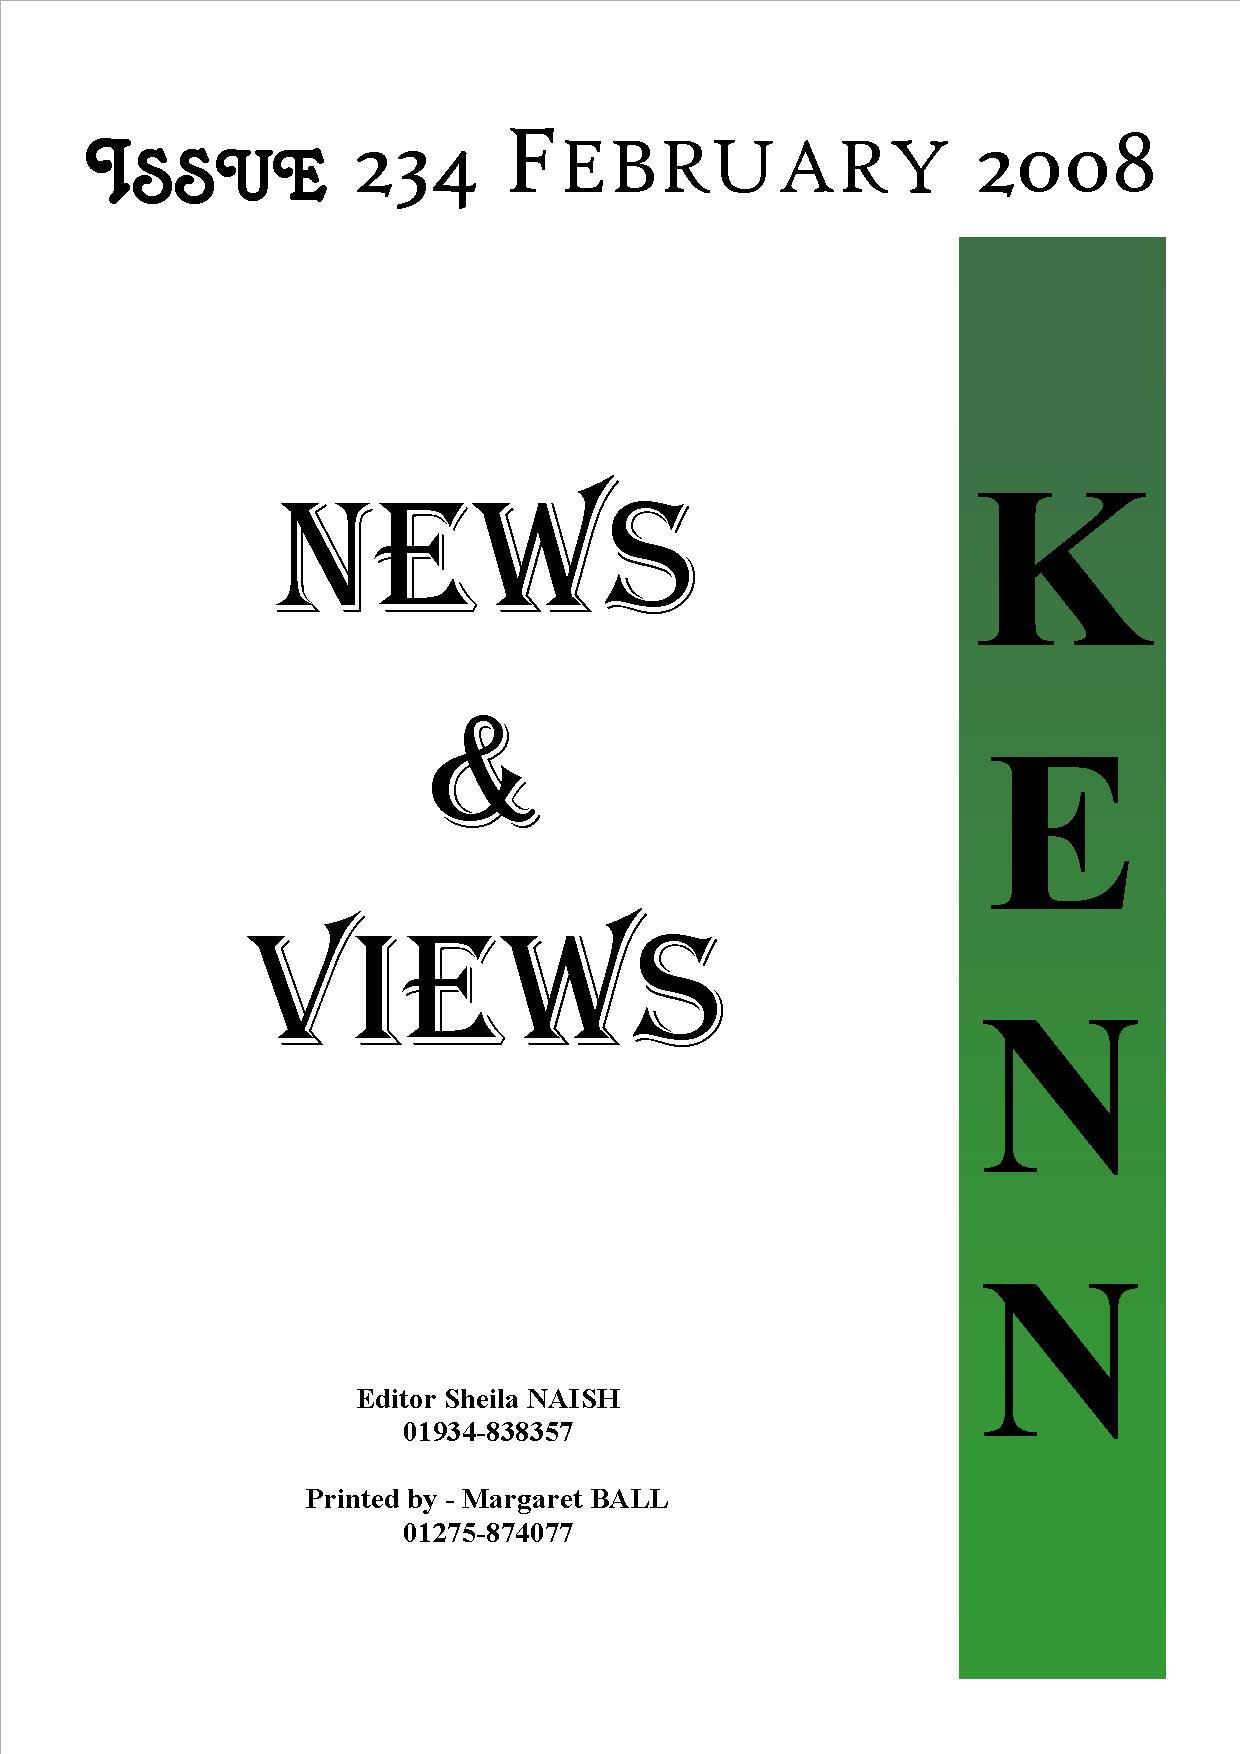 february 2008 cover